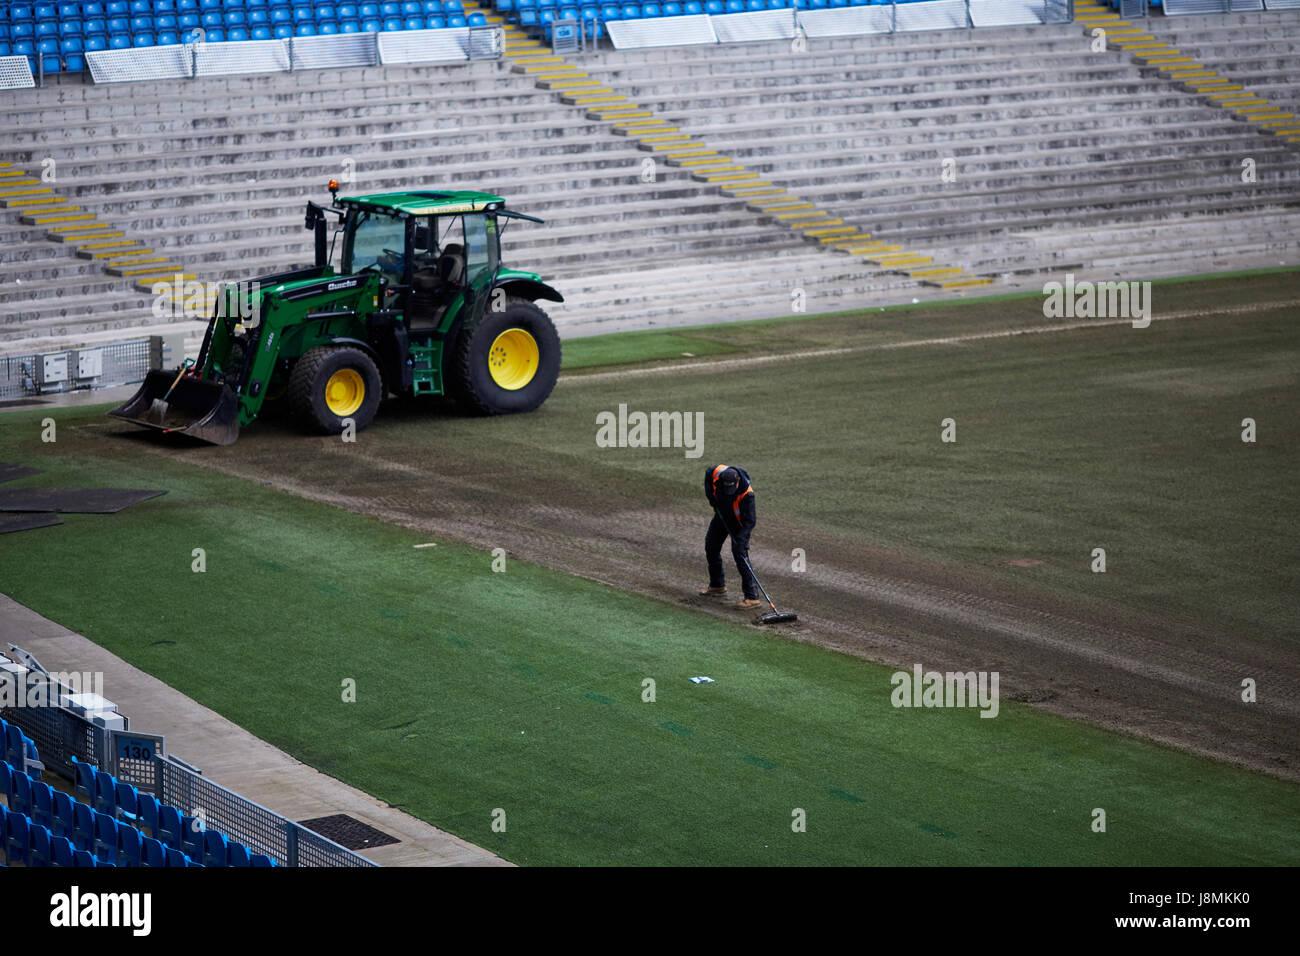 Manchester City Etihad Stadium  pitch repair, - Stock Image